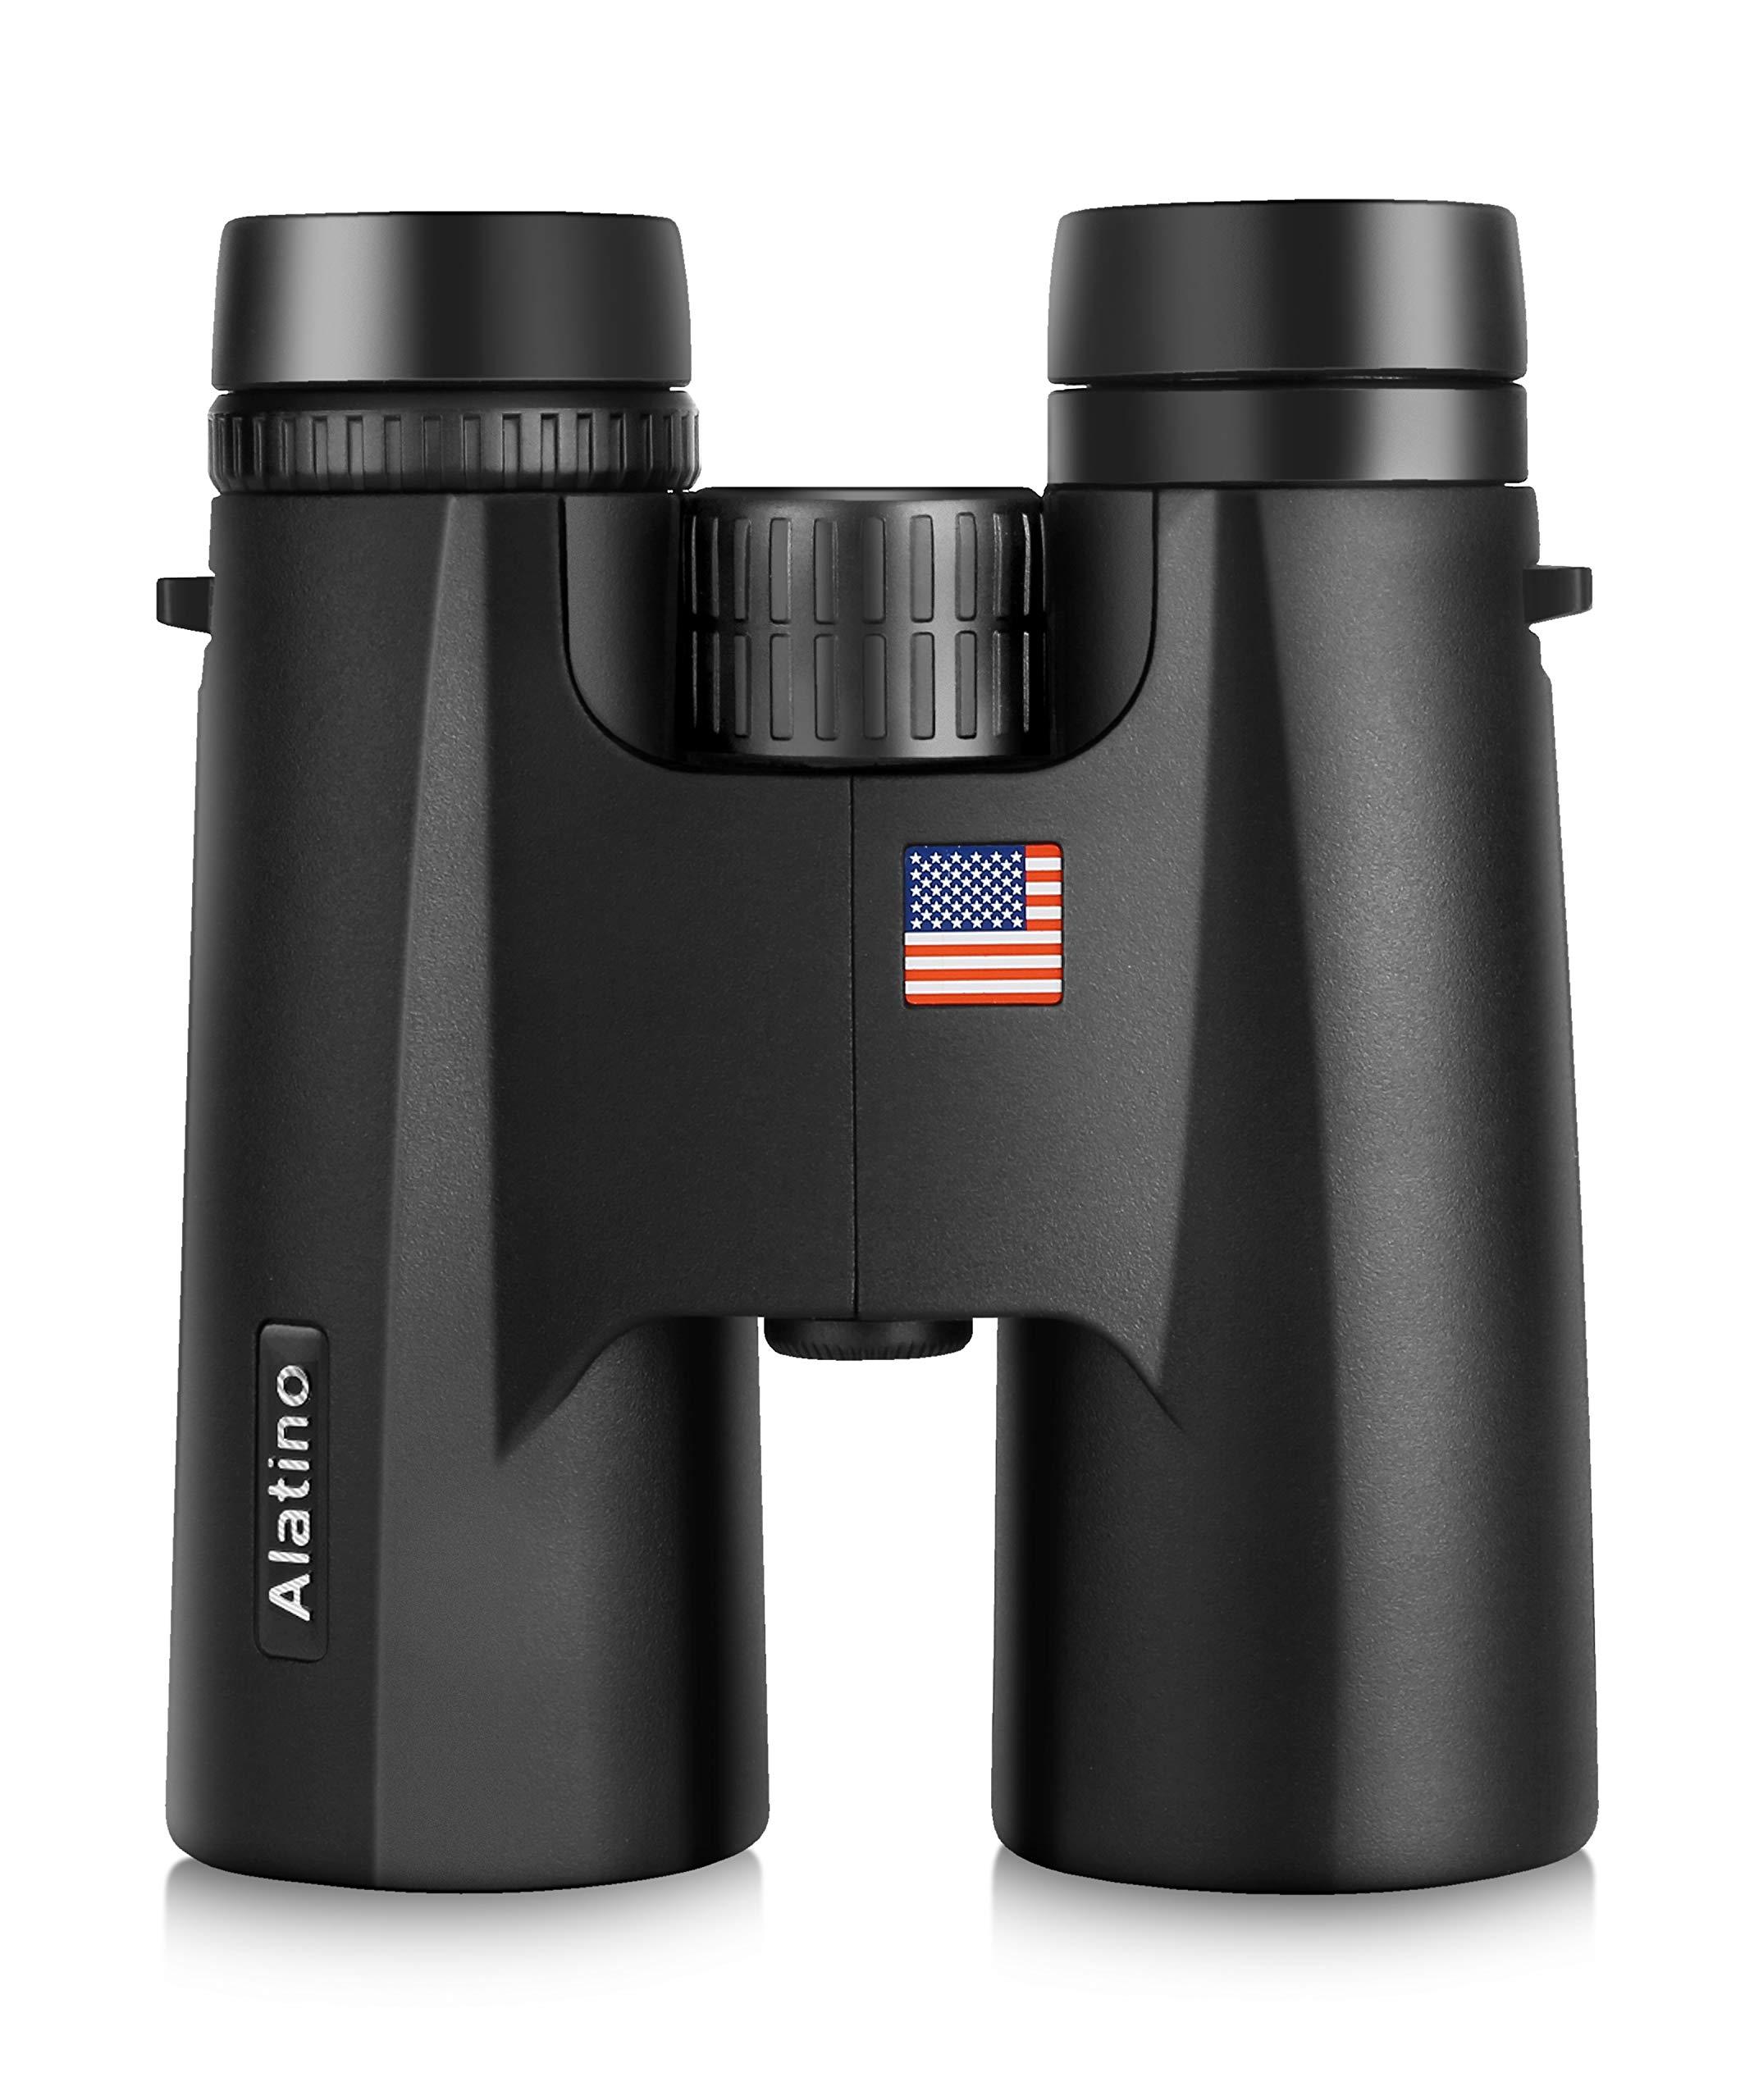 10x42 Binoculars for Adult Beginners, 18mm Large View Eyepiece Roof Prism Binoculars for Bird Watching, Hunting and Outdoor Activities